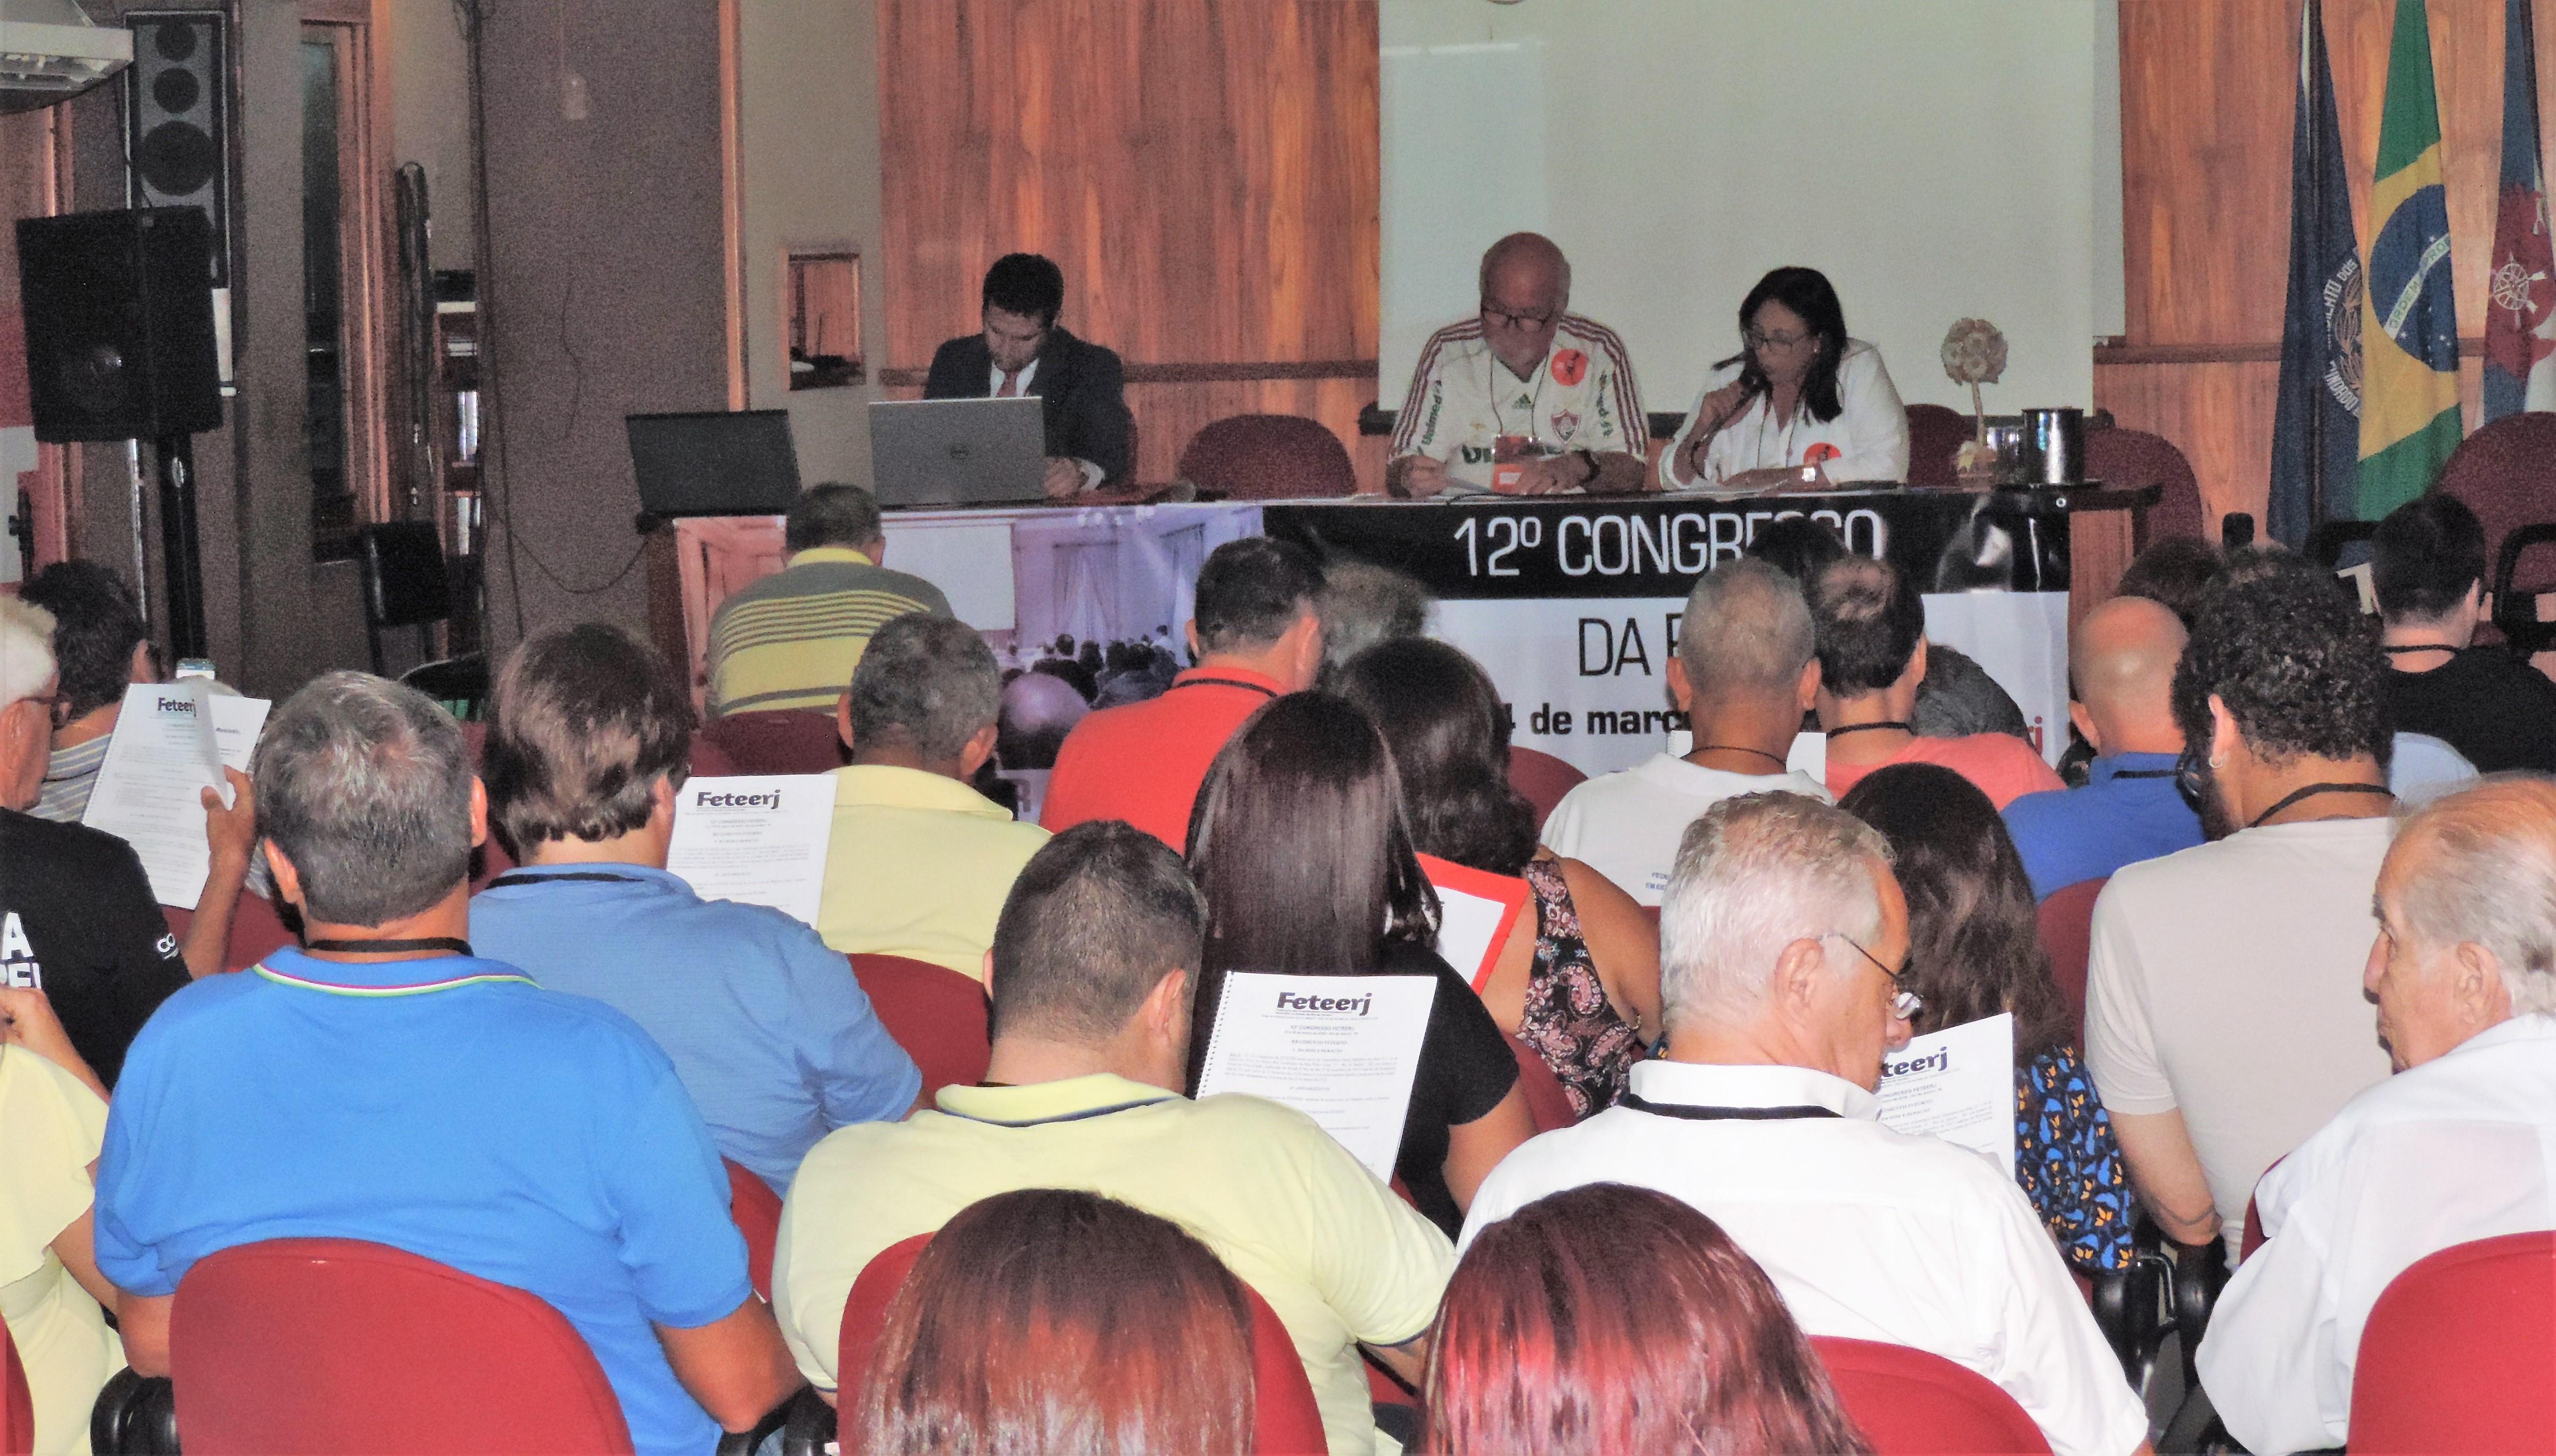 Feteerj realiza seu 12º Congresso